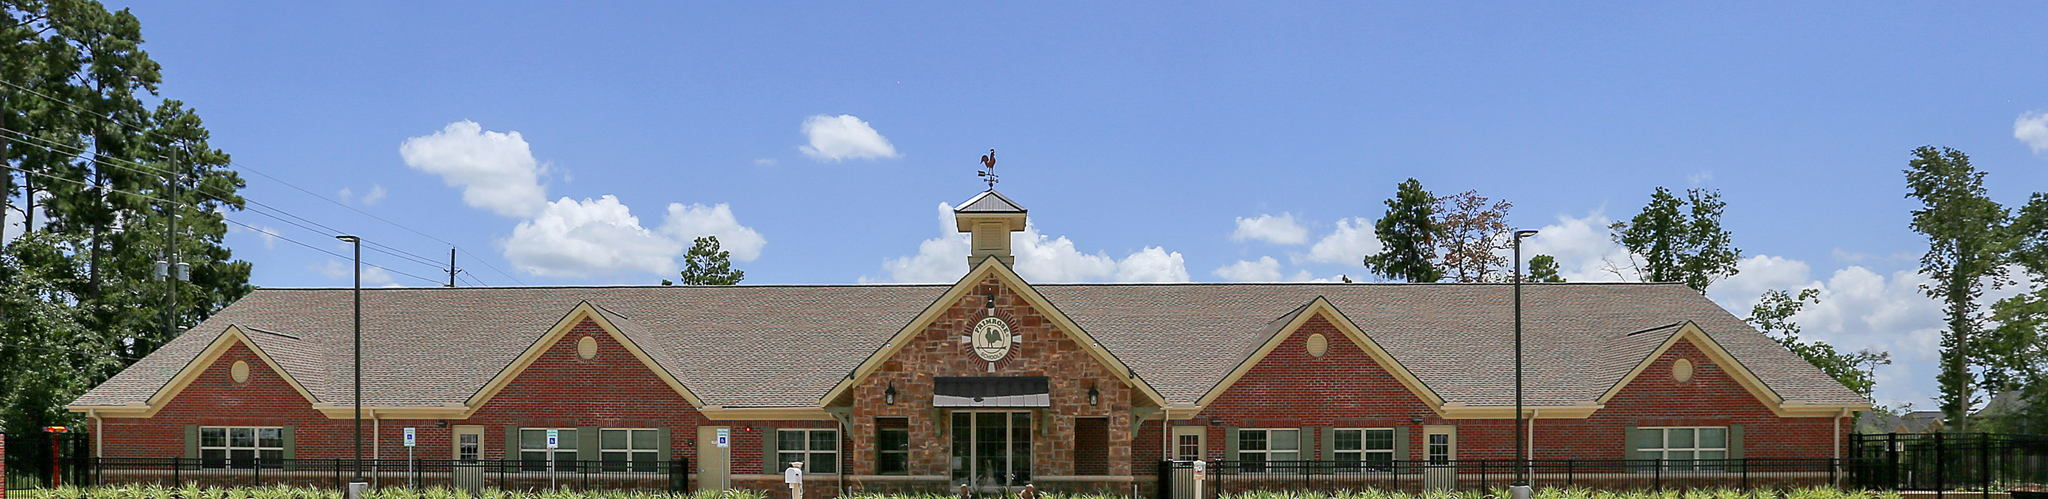 Exterior of a Primrose School of Lakeshore